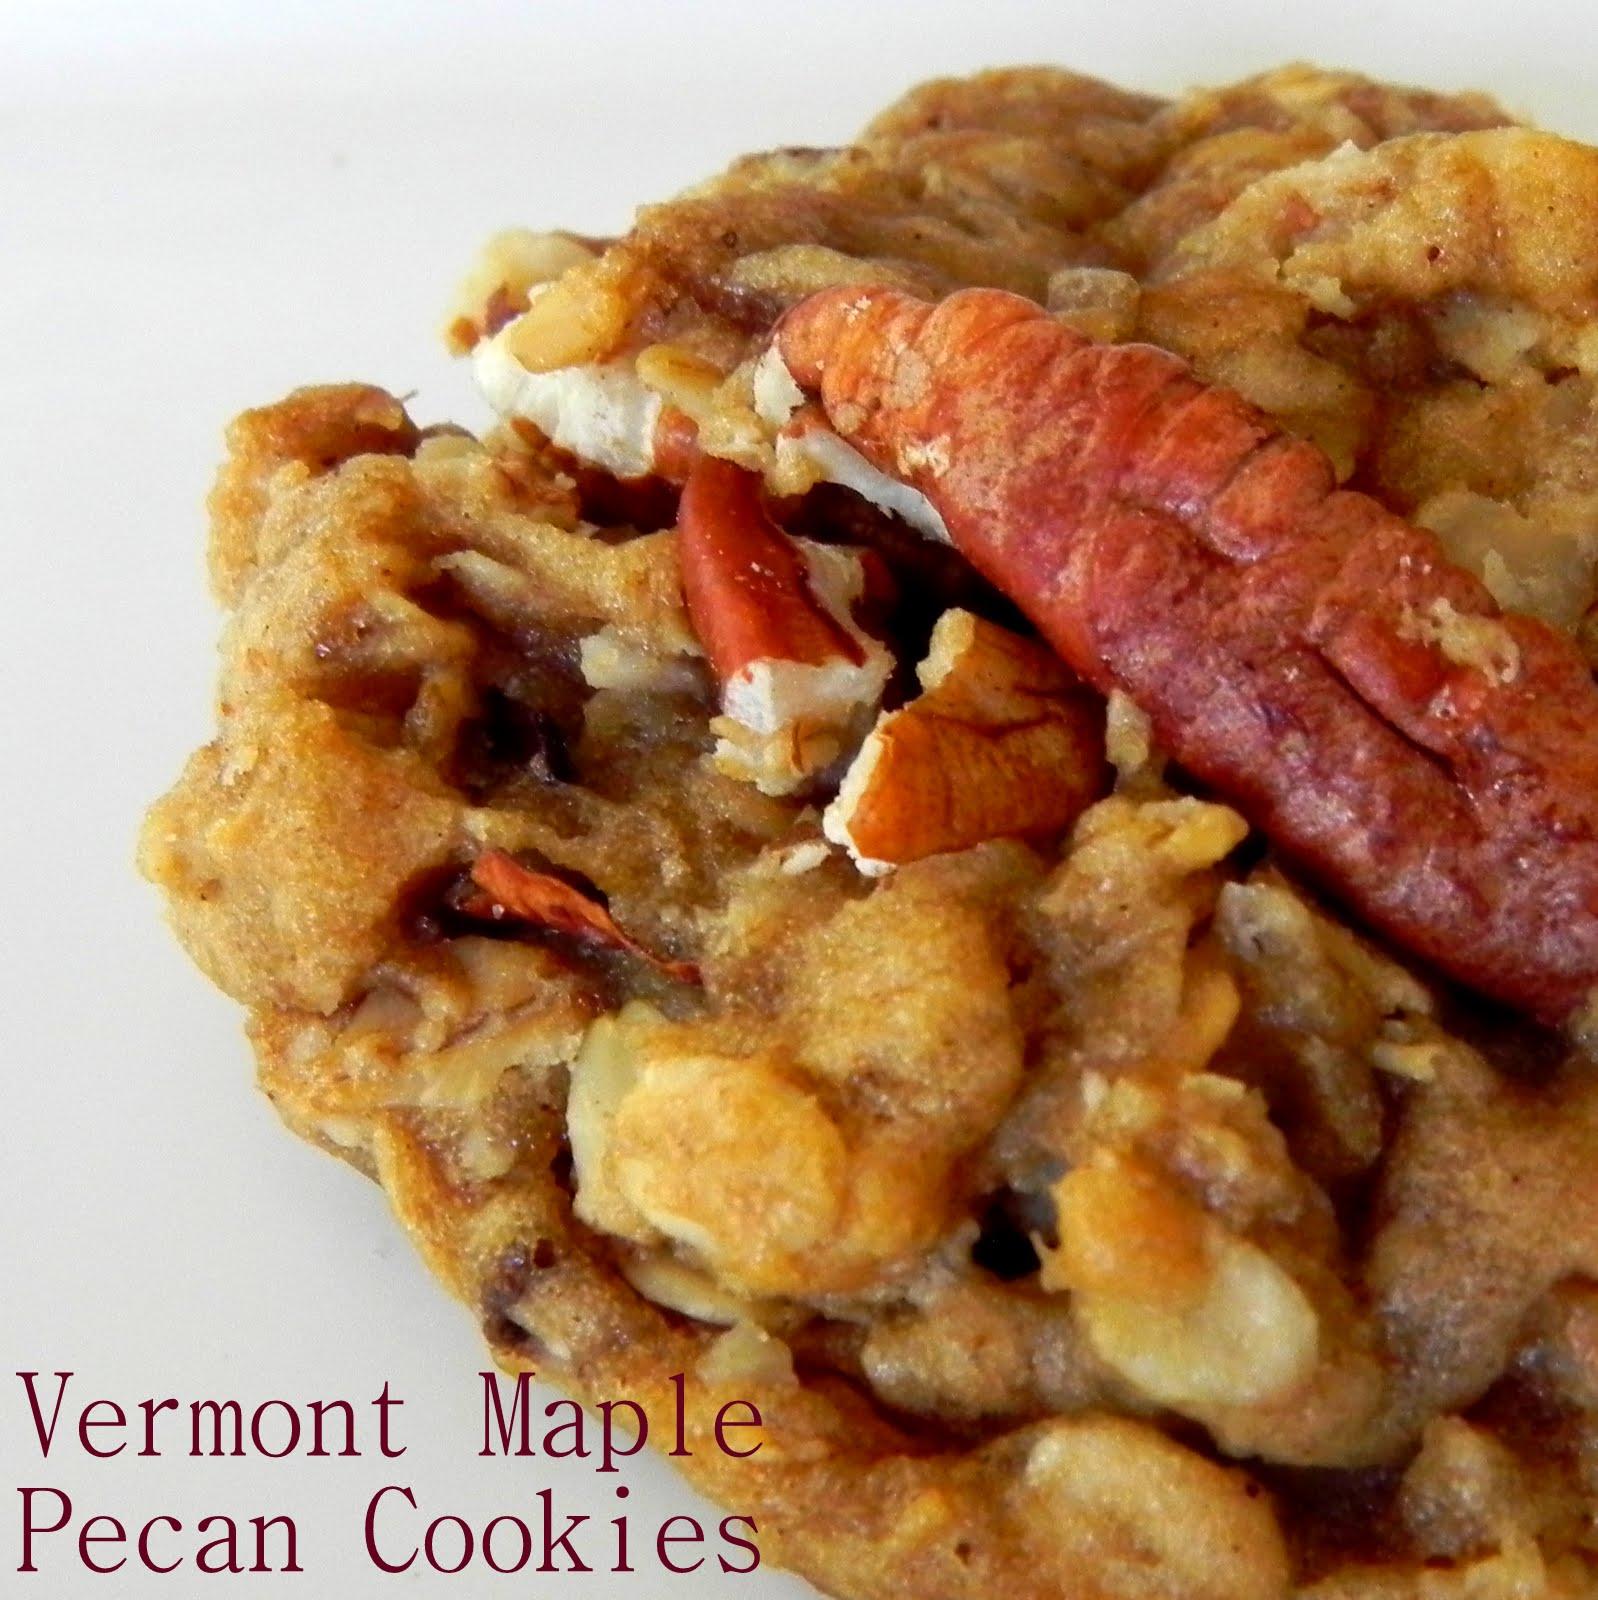 Recipe for vermont maple pecan cookies